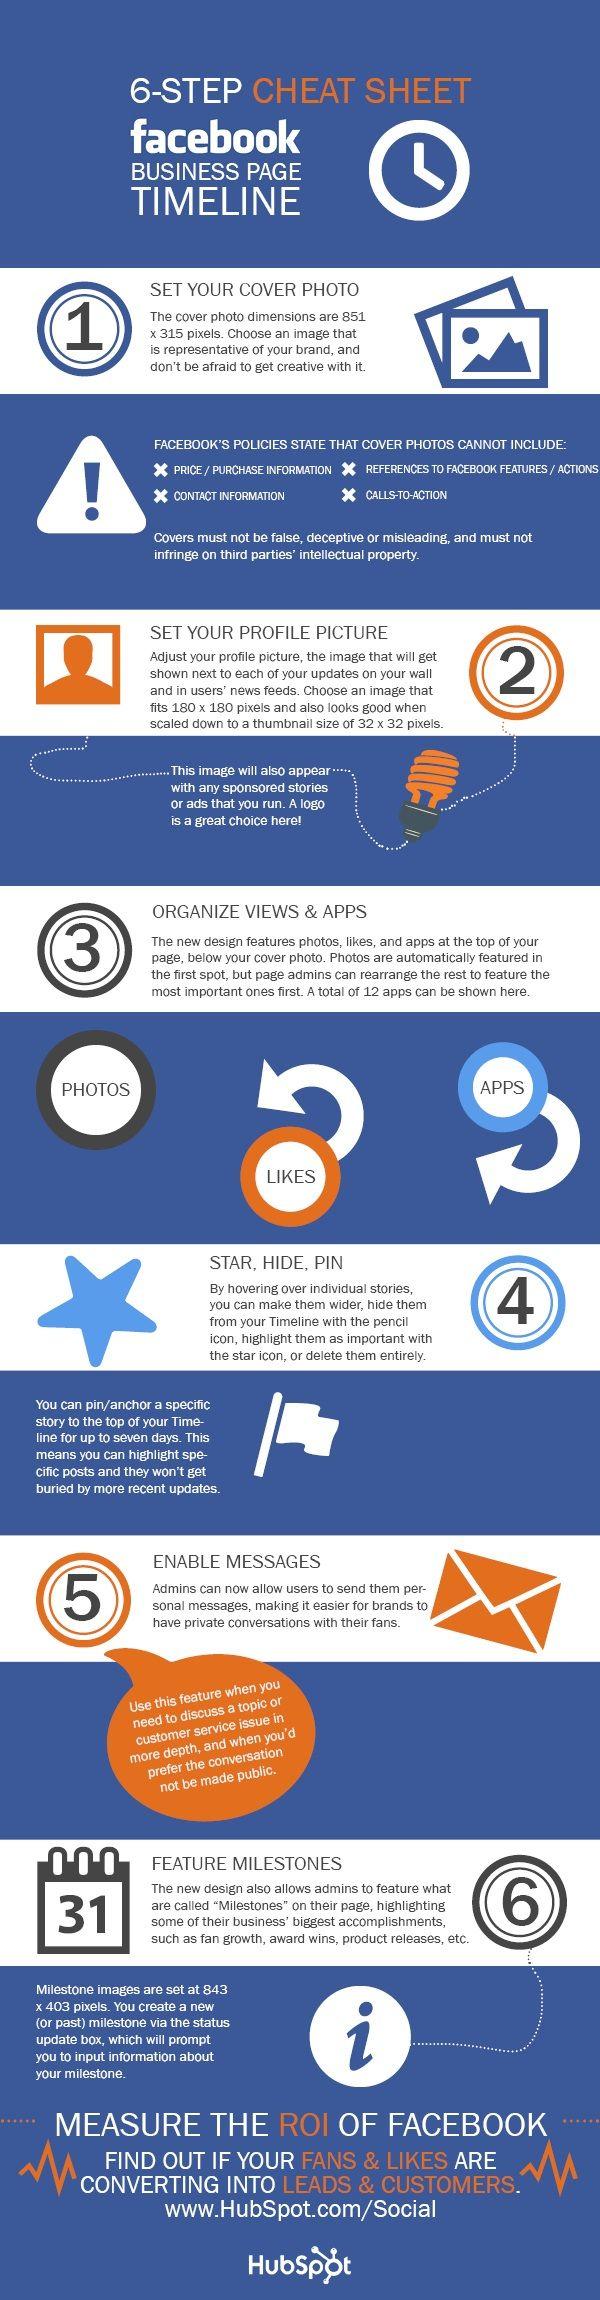 6 steps cheatsheet Facebook Business Page Timeline